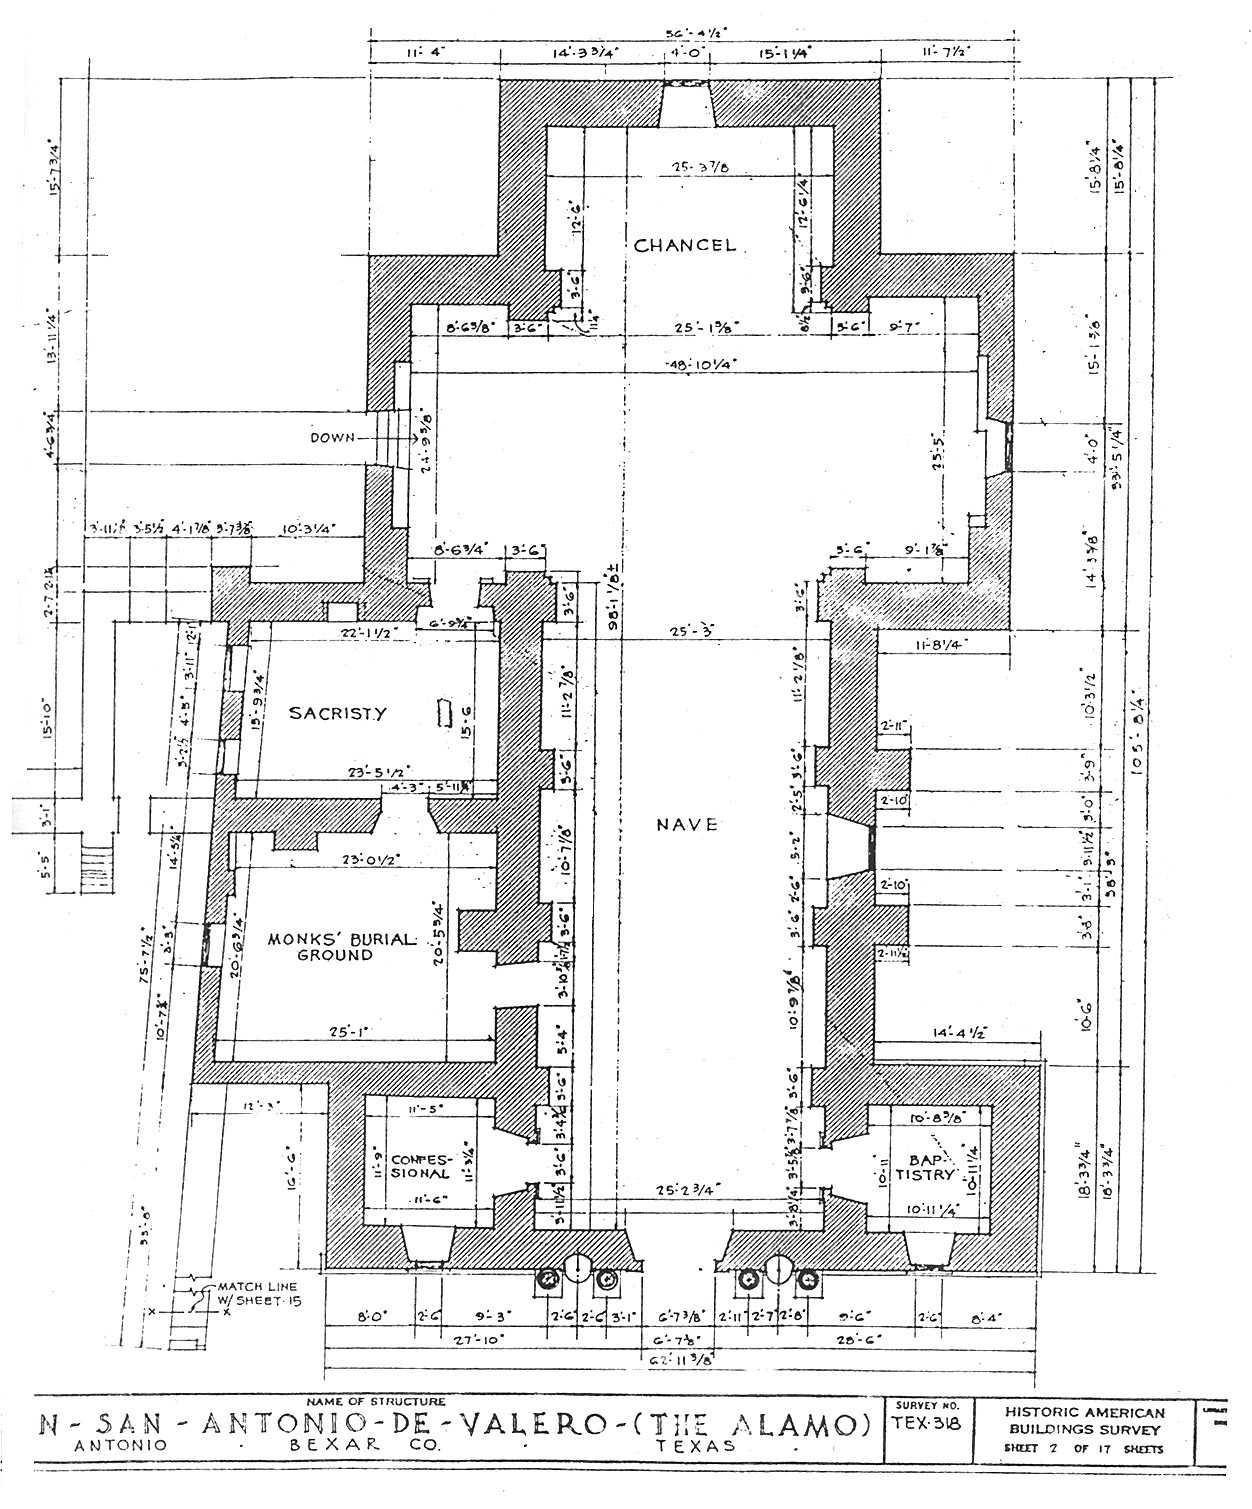 Alamo Floor Plan 1836 100 Alamo Floor Plan 1836 The